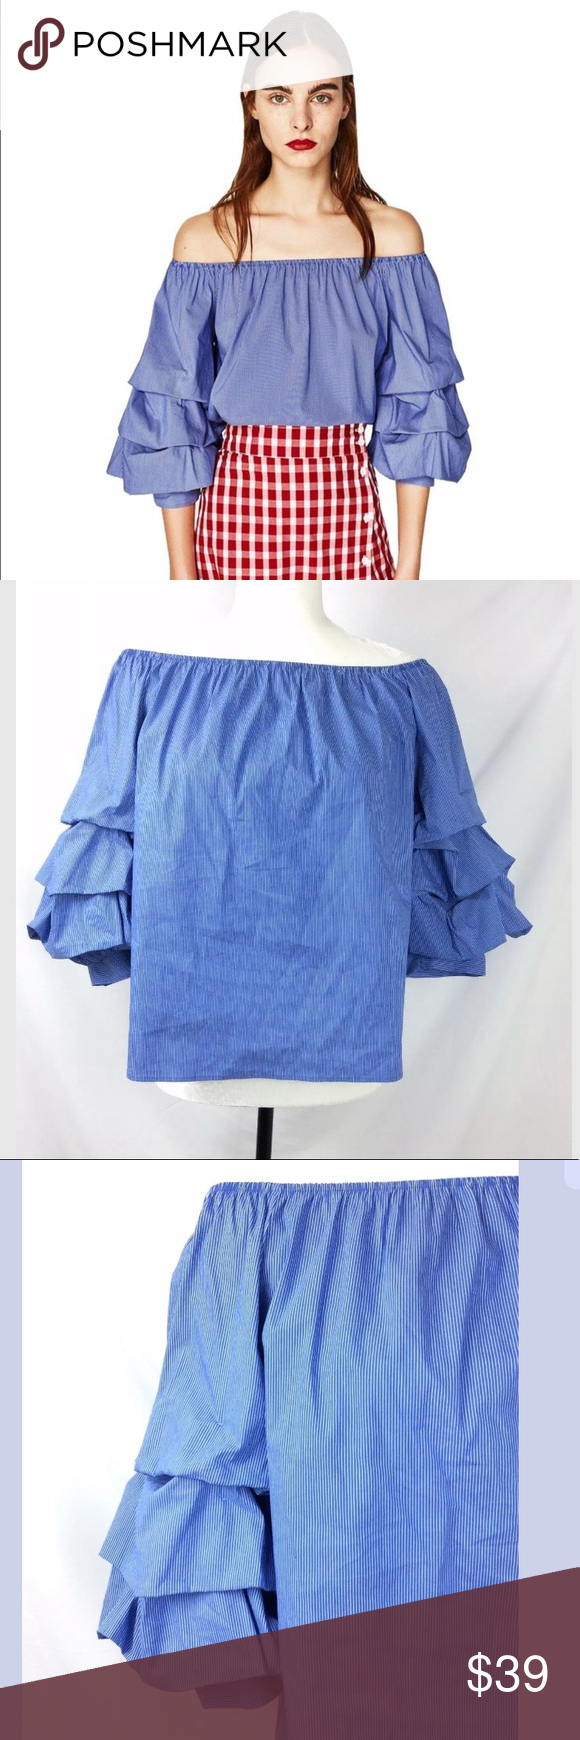 2d09709f Zara Top M Blue striped Off Shoulder ruffle Sleeve Zara Woman blouse ...